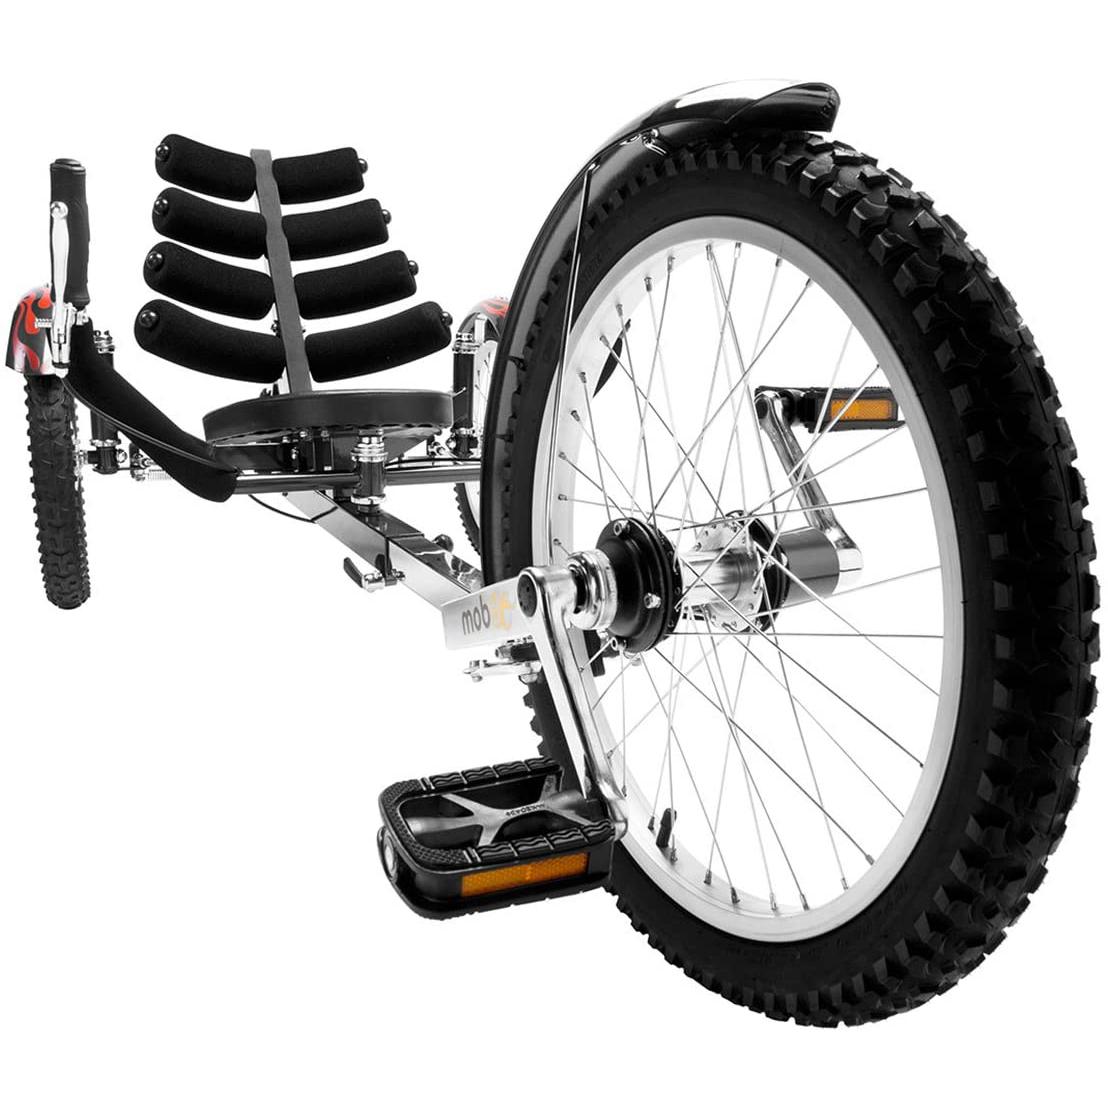 Mobo Shift Recumbent Bicycle